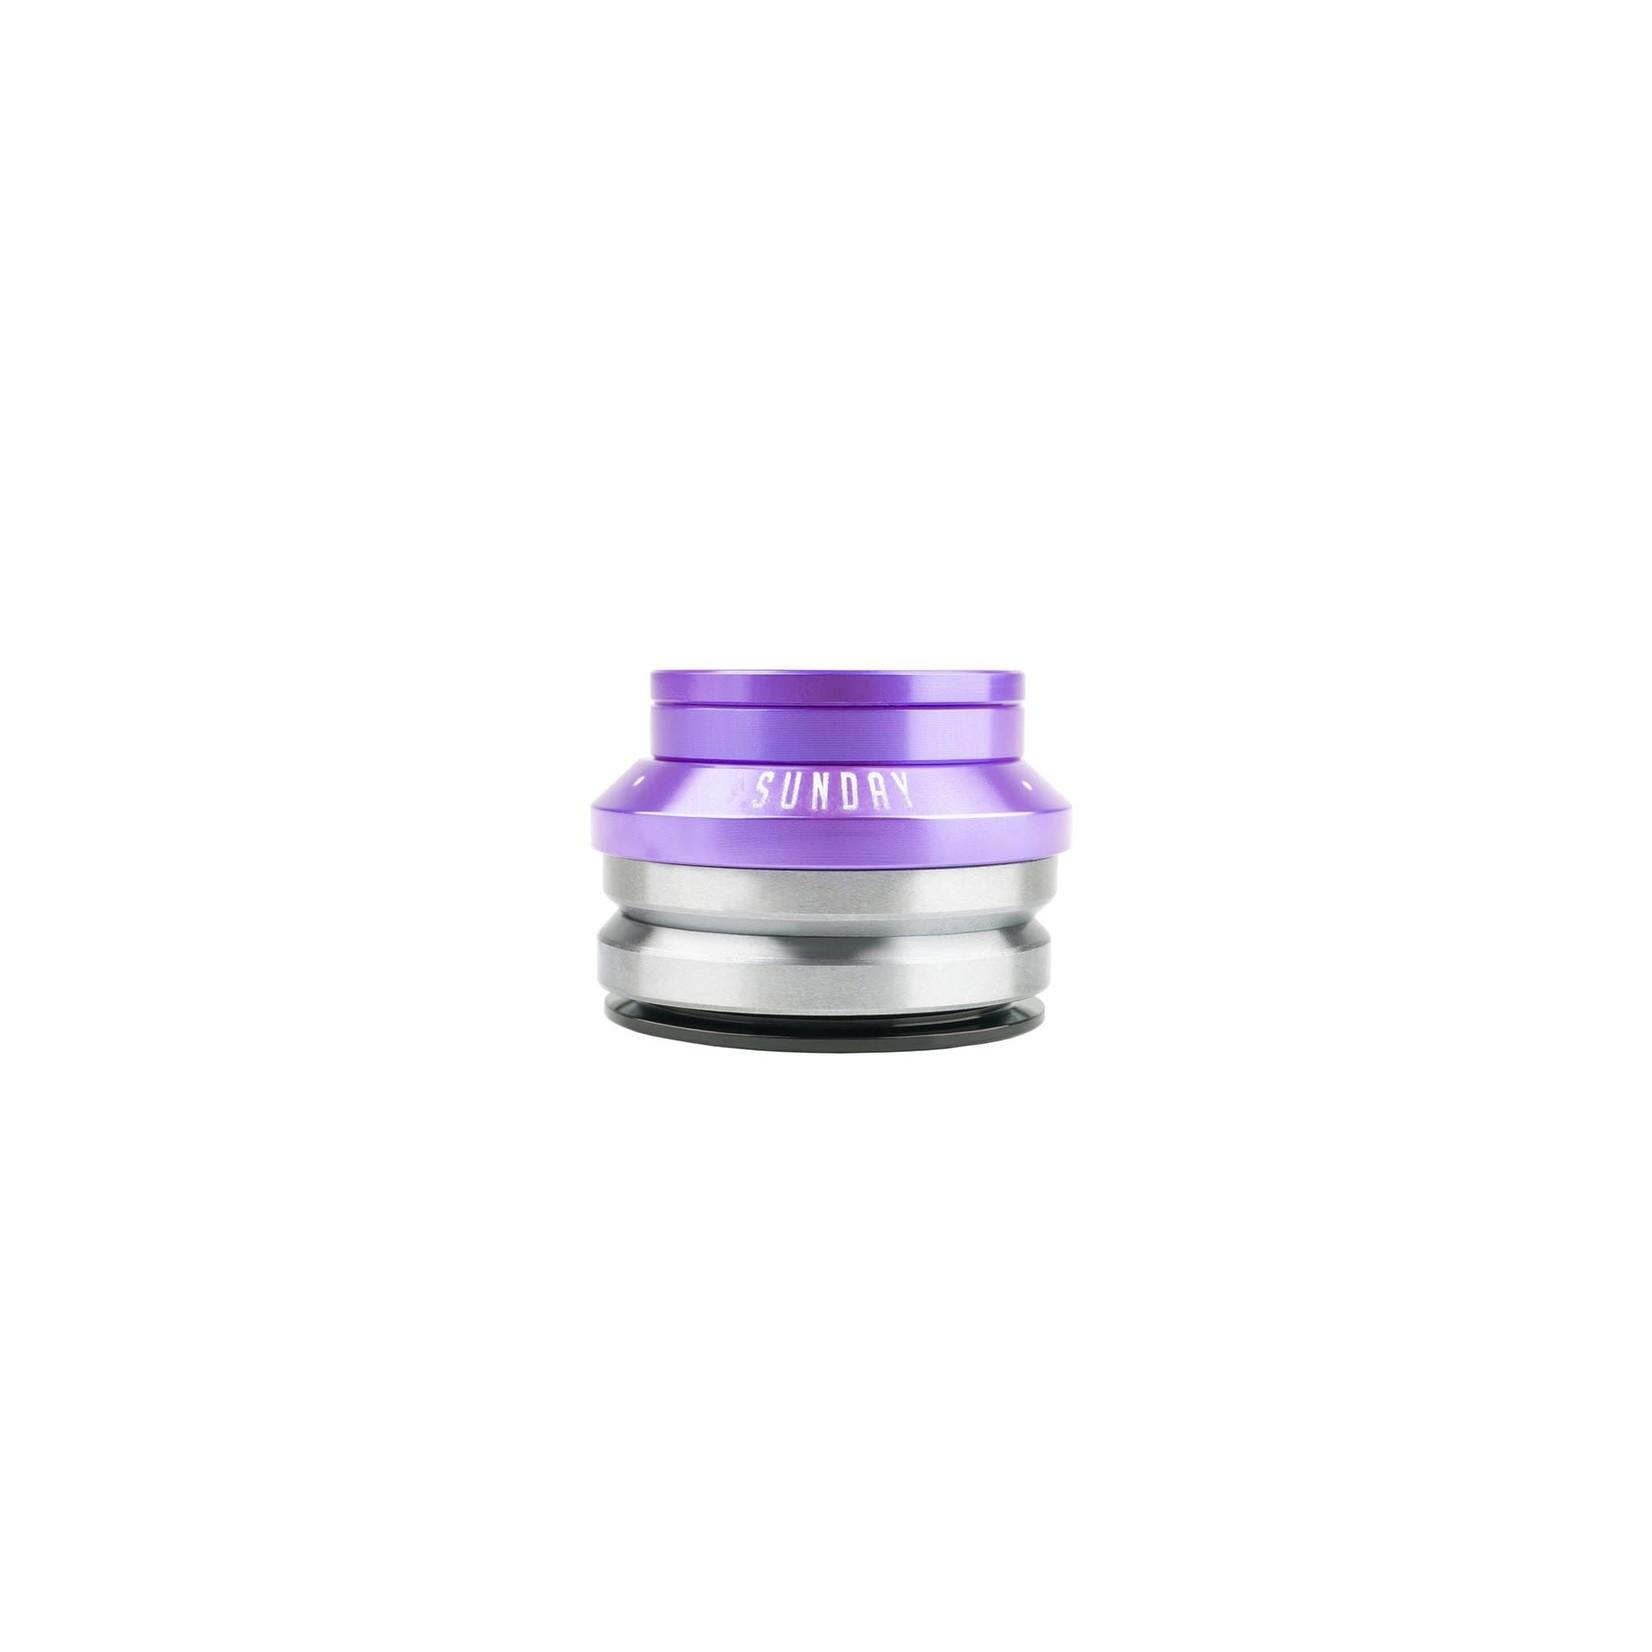 "Sunday Sunday Integrated Headset - 1-1/8"", 5mm, Anodized Purple"